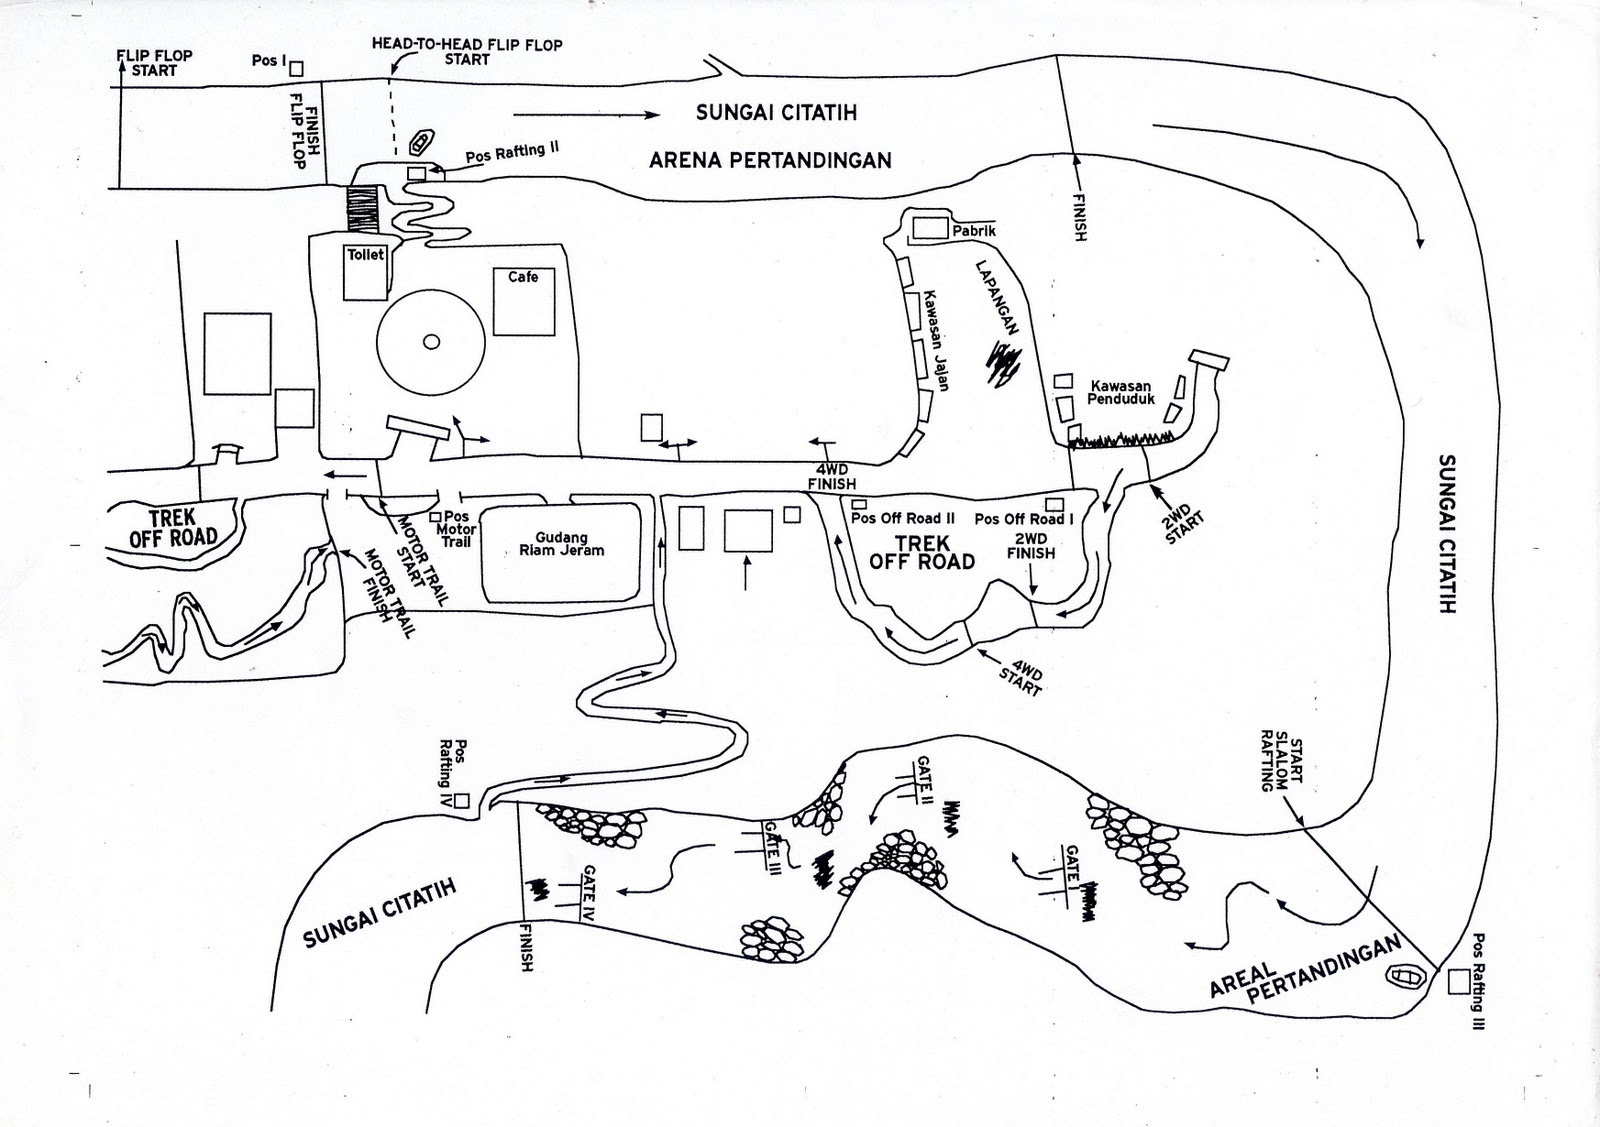 93 Honda Accord Starter Wiring Diagram Big Tex Dump Trailer 2006 Ridgeline Timing Marks Imageresizertool Com